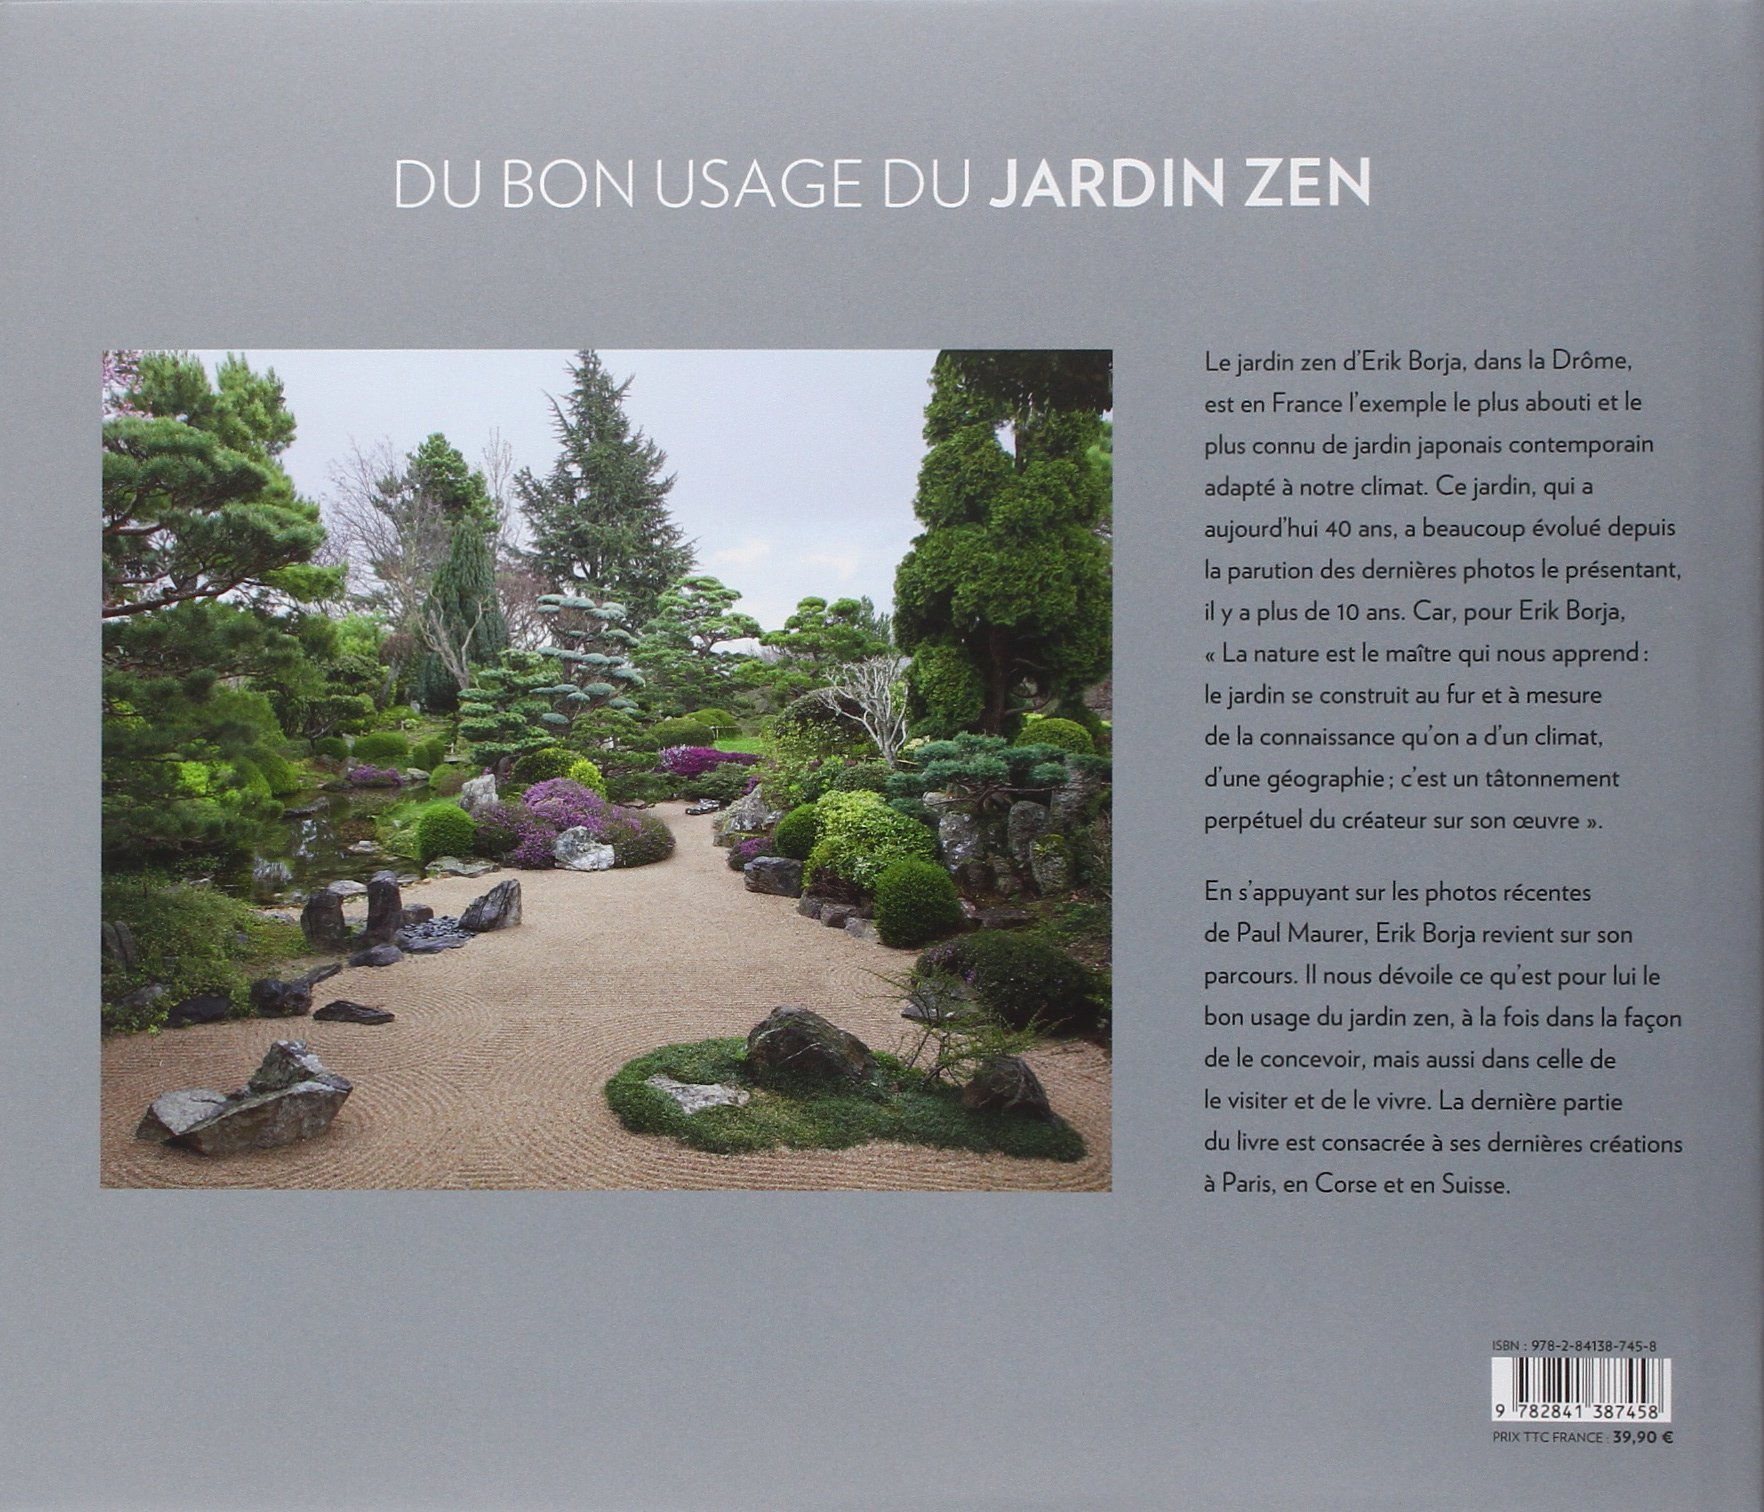 Du bon usage du jardin zen: Amazon.es: Borja, Erik, Maurer, Paul: Libros en idiomas extranjeros